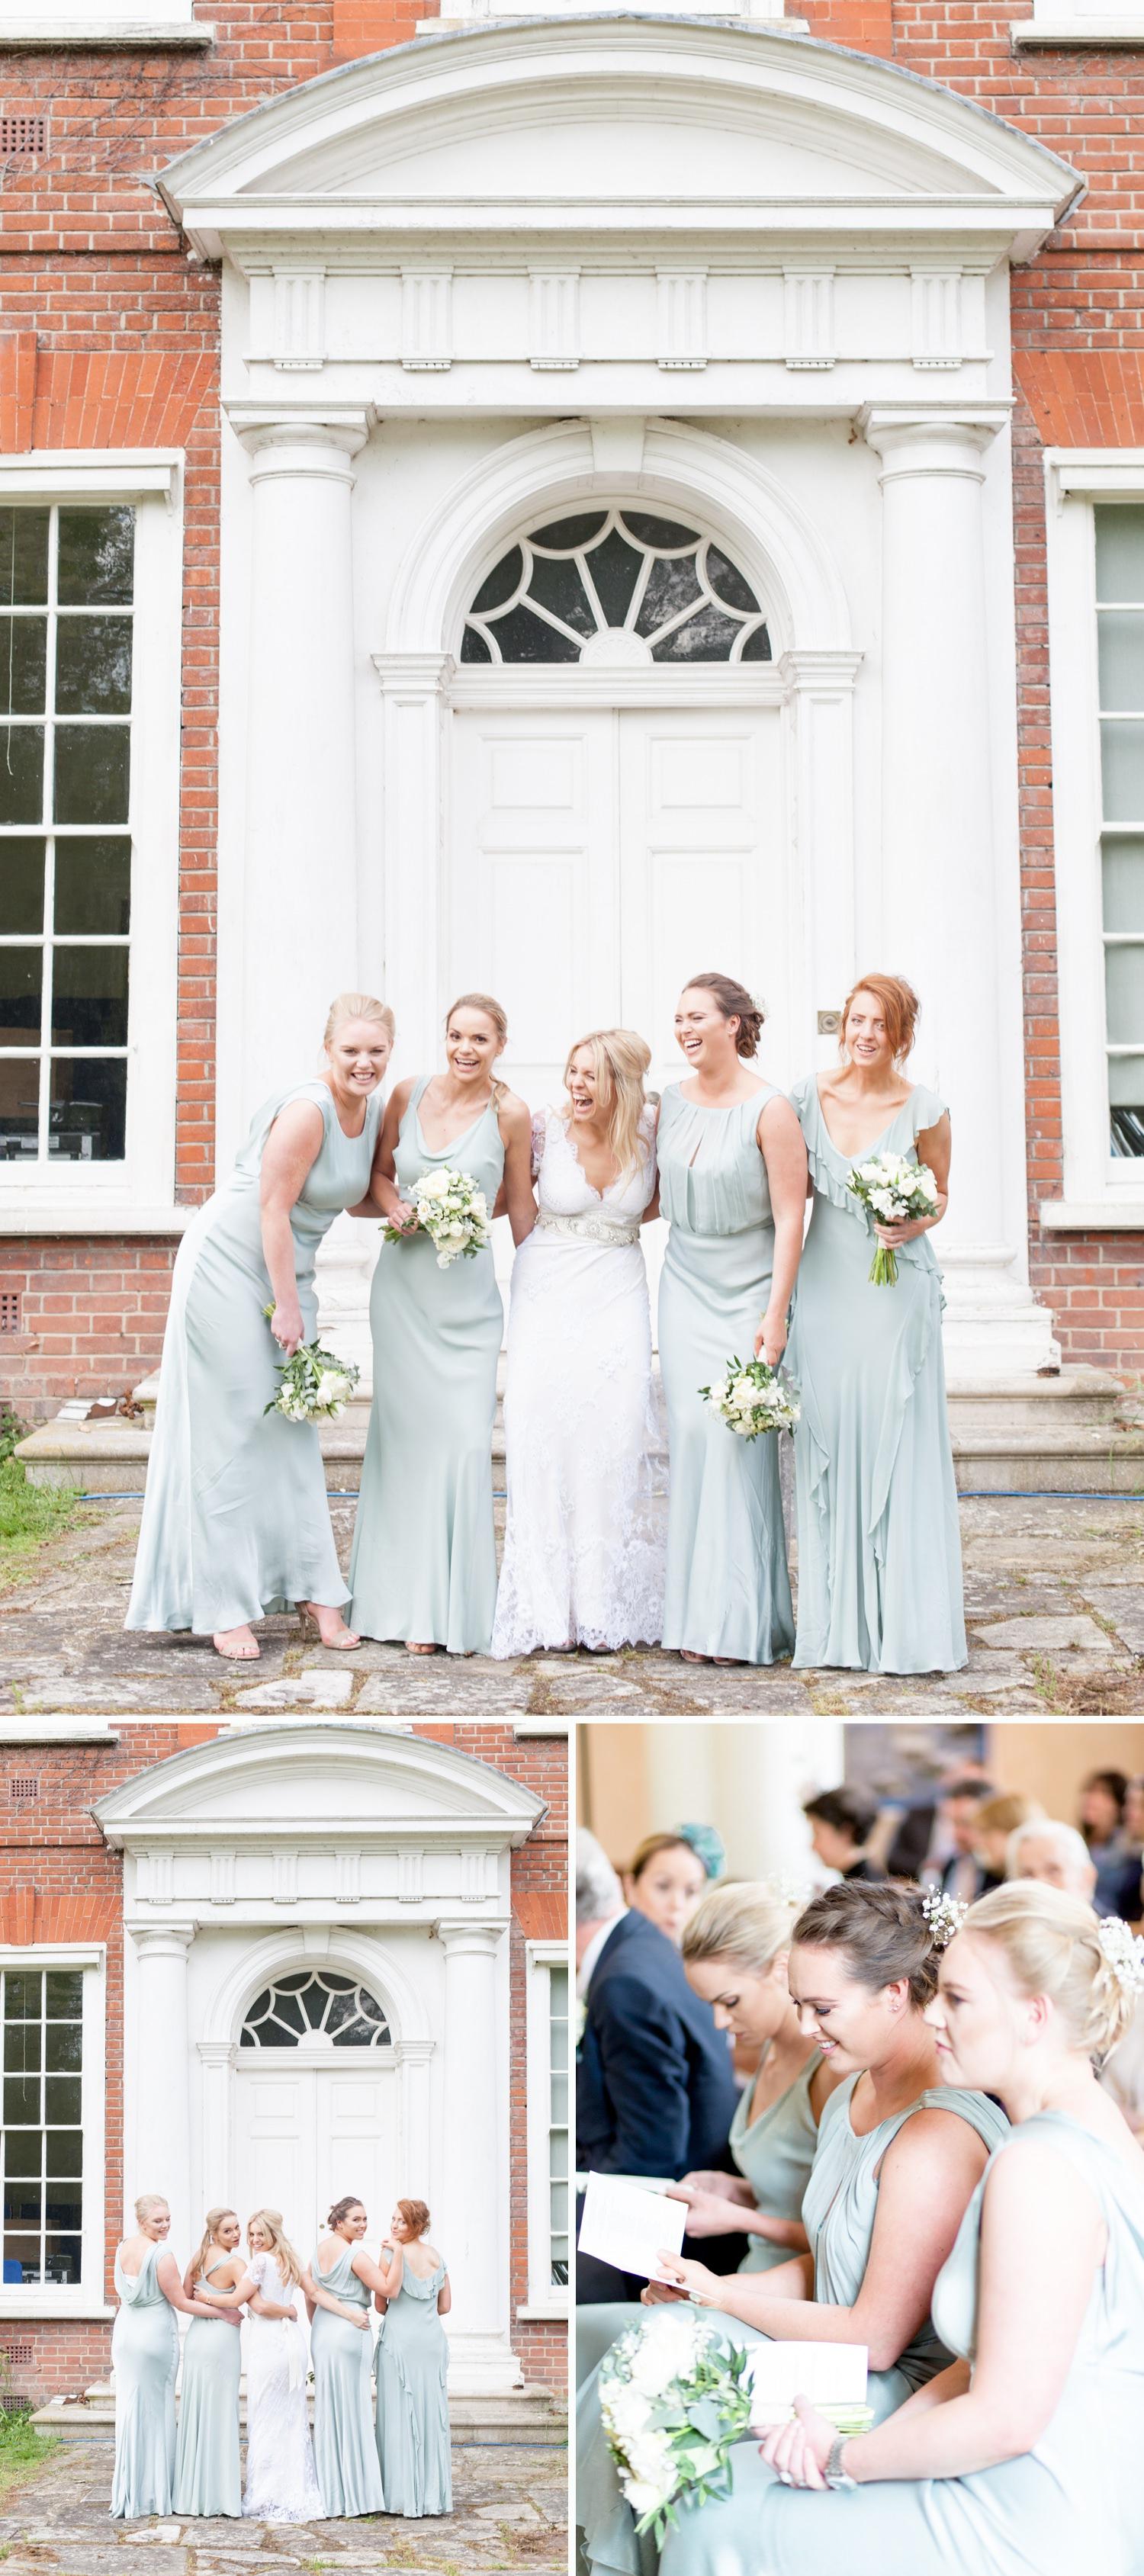 Emily & Jonathan's Cambridgeshire wedding - a bride with her bridesmaids